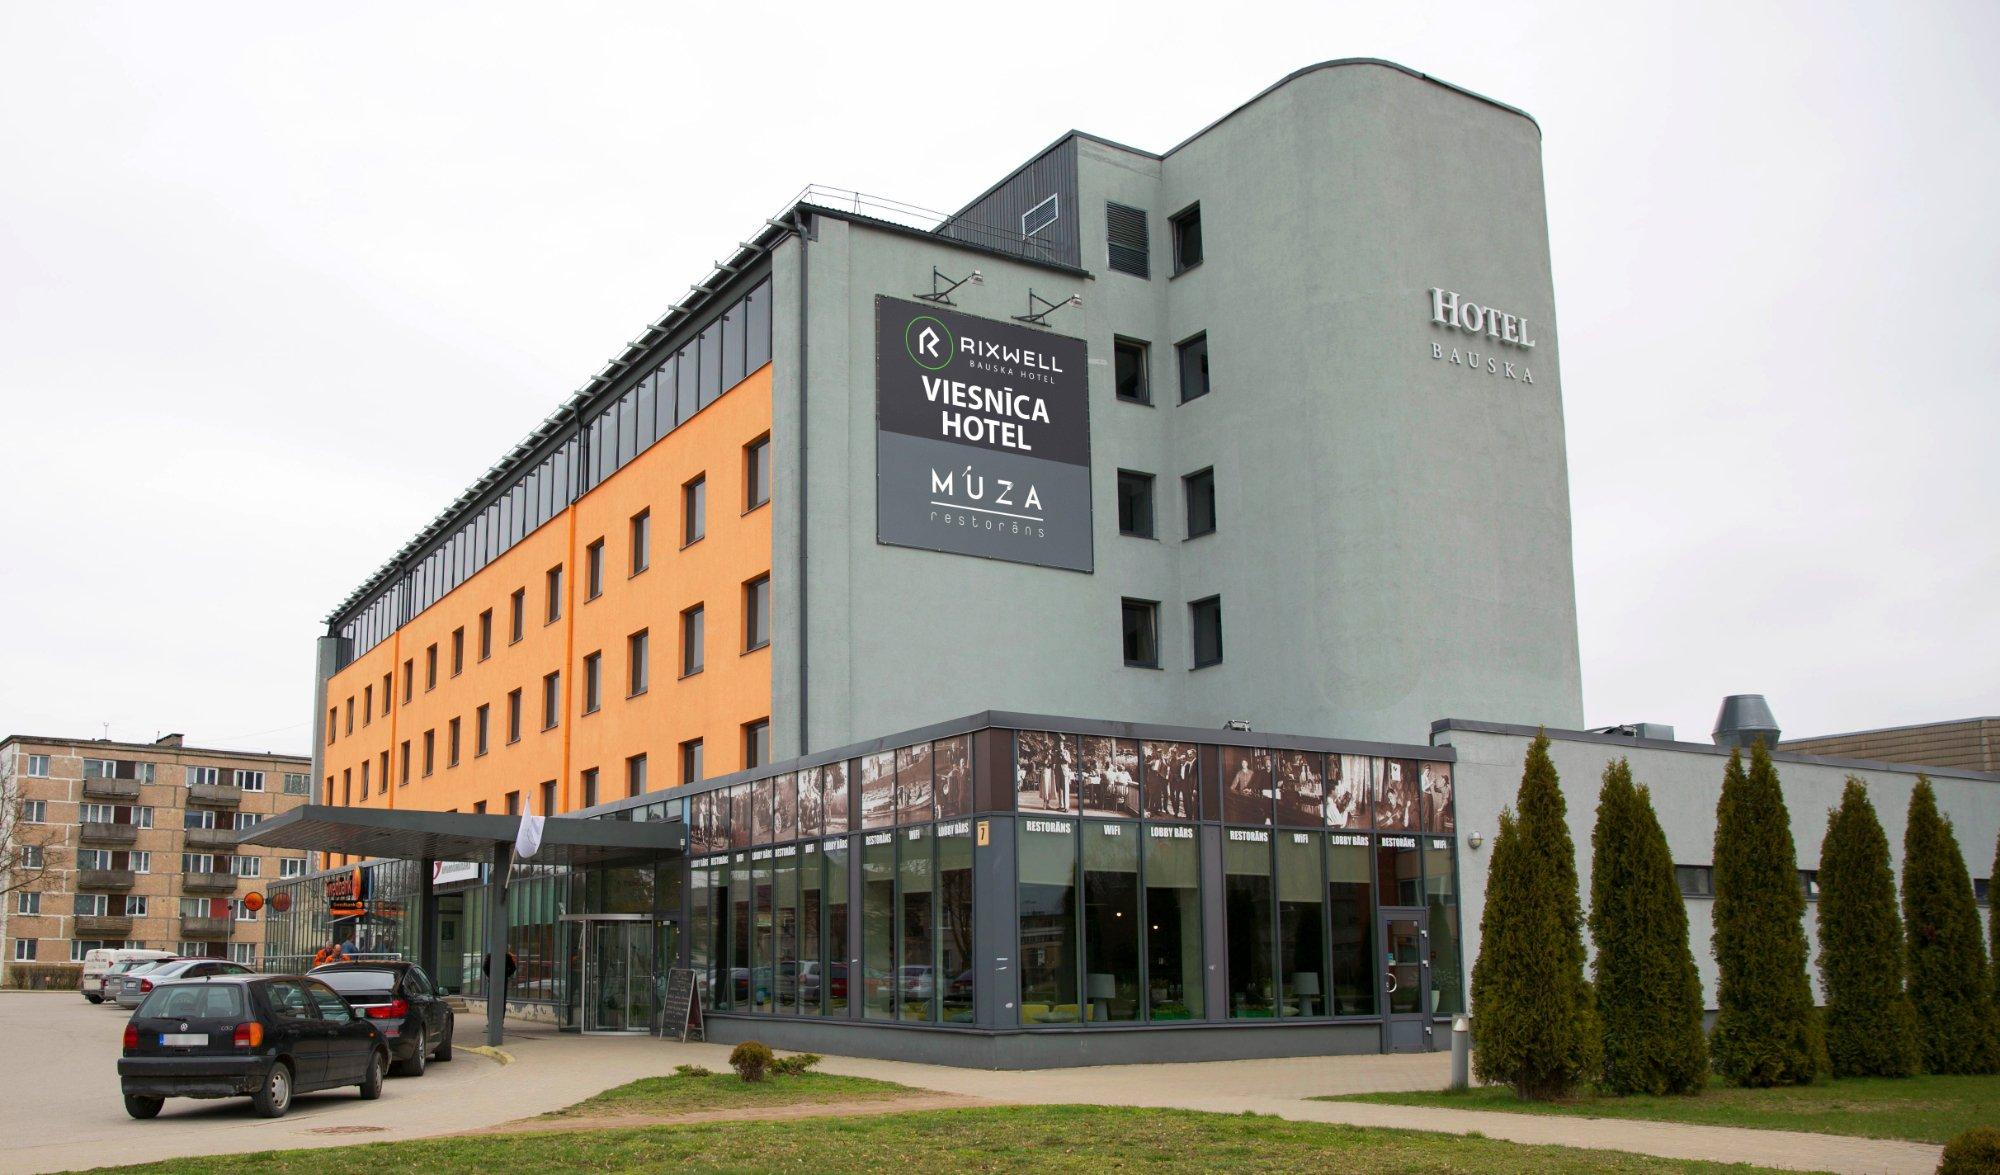 Rixwell Bauska Hotel